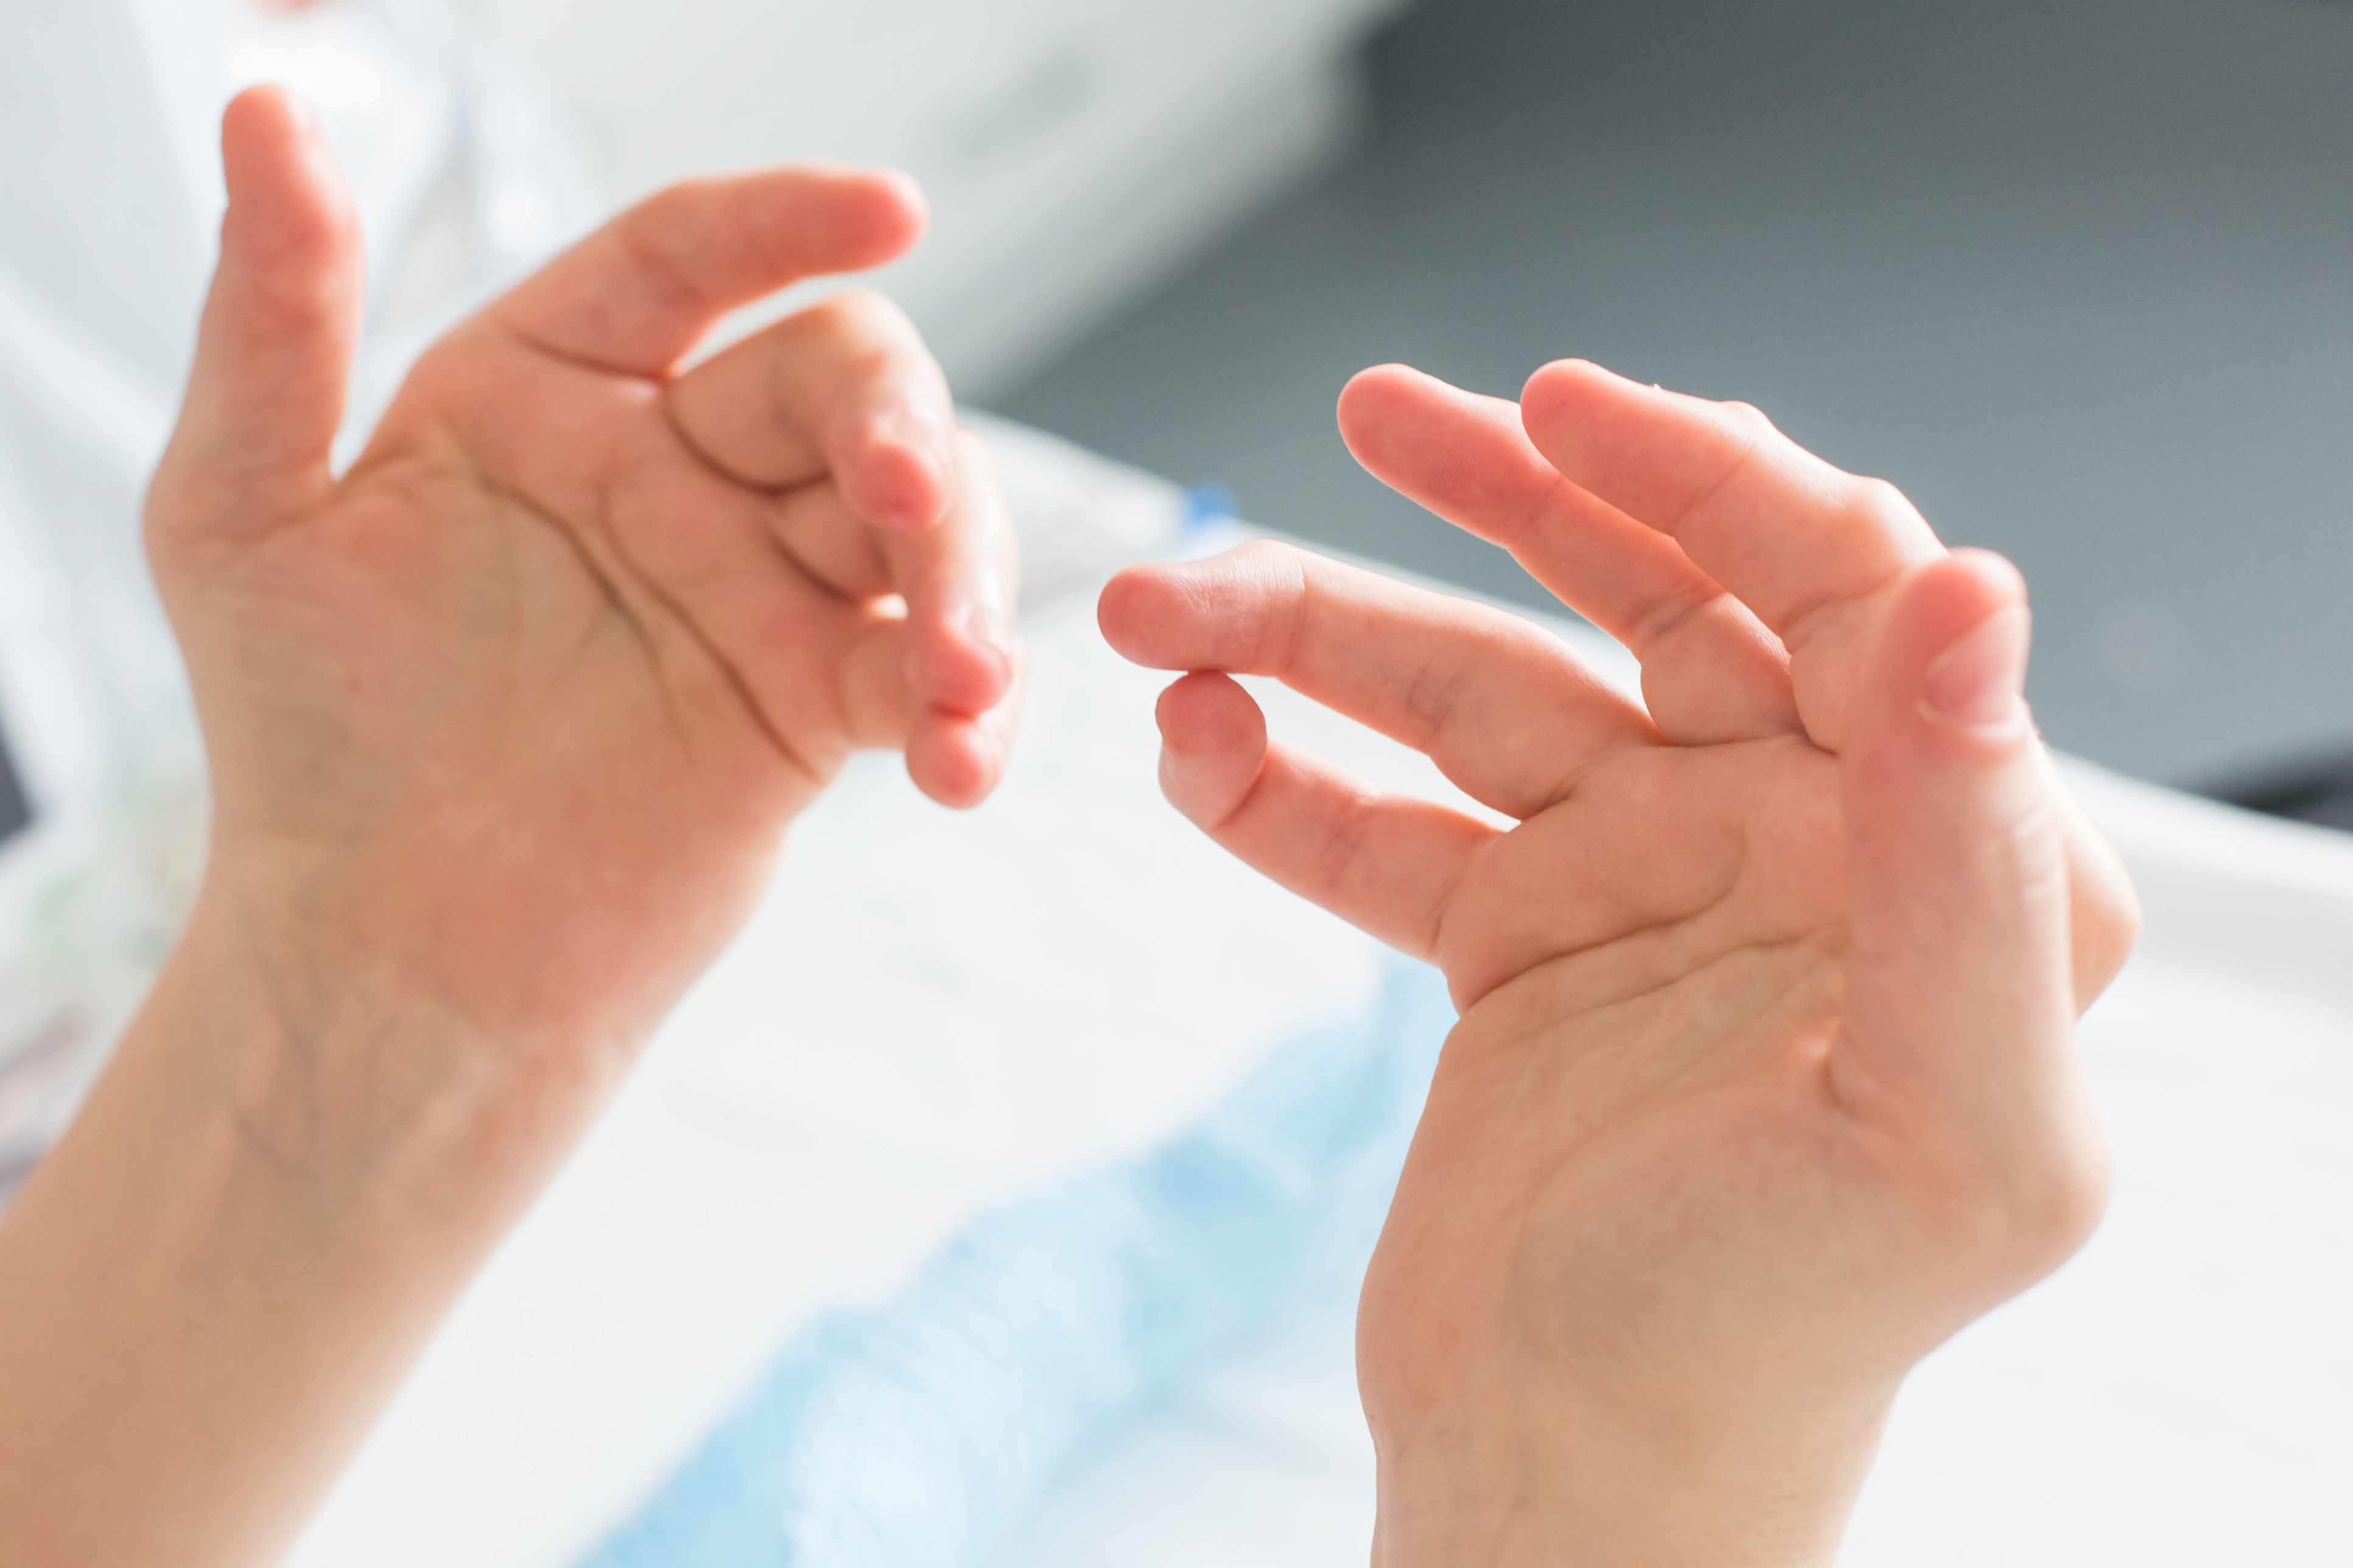 Hands of a woman with rheumatoid arthritis.